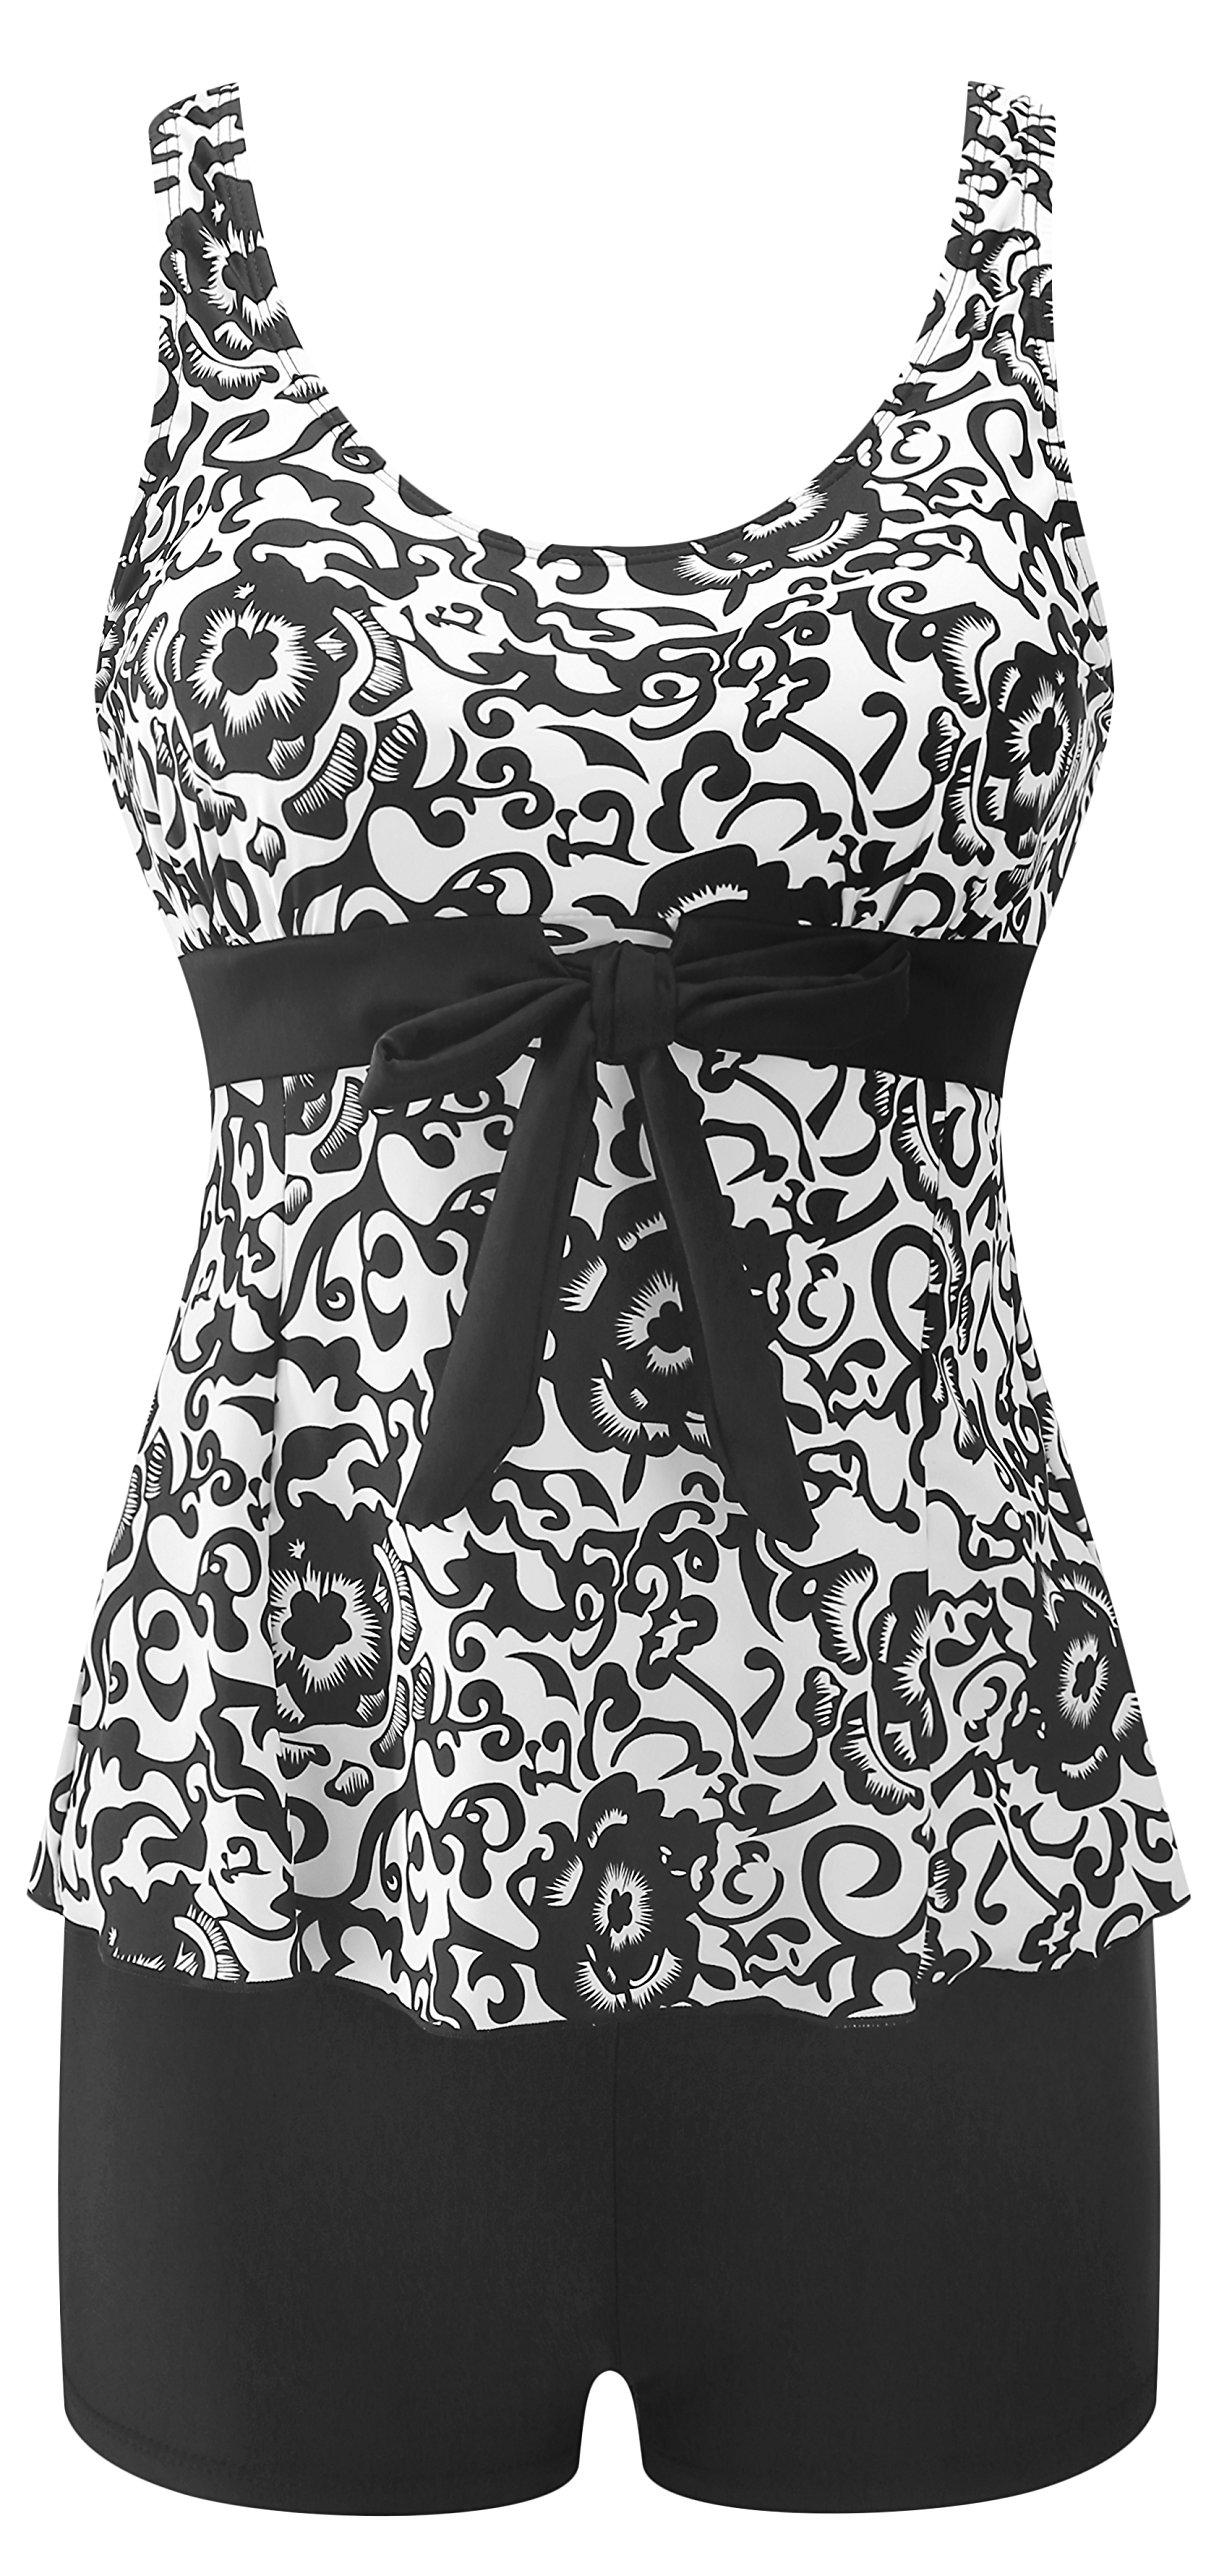 1e4bda255e128 Galleon - Wantdo Women's High Waisted Swimsuit Modest Bathing Suit Cover Up  Swimwear Black&White US 16-18